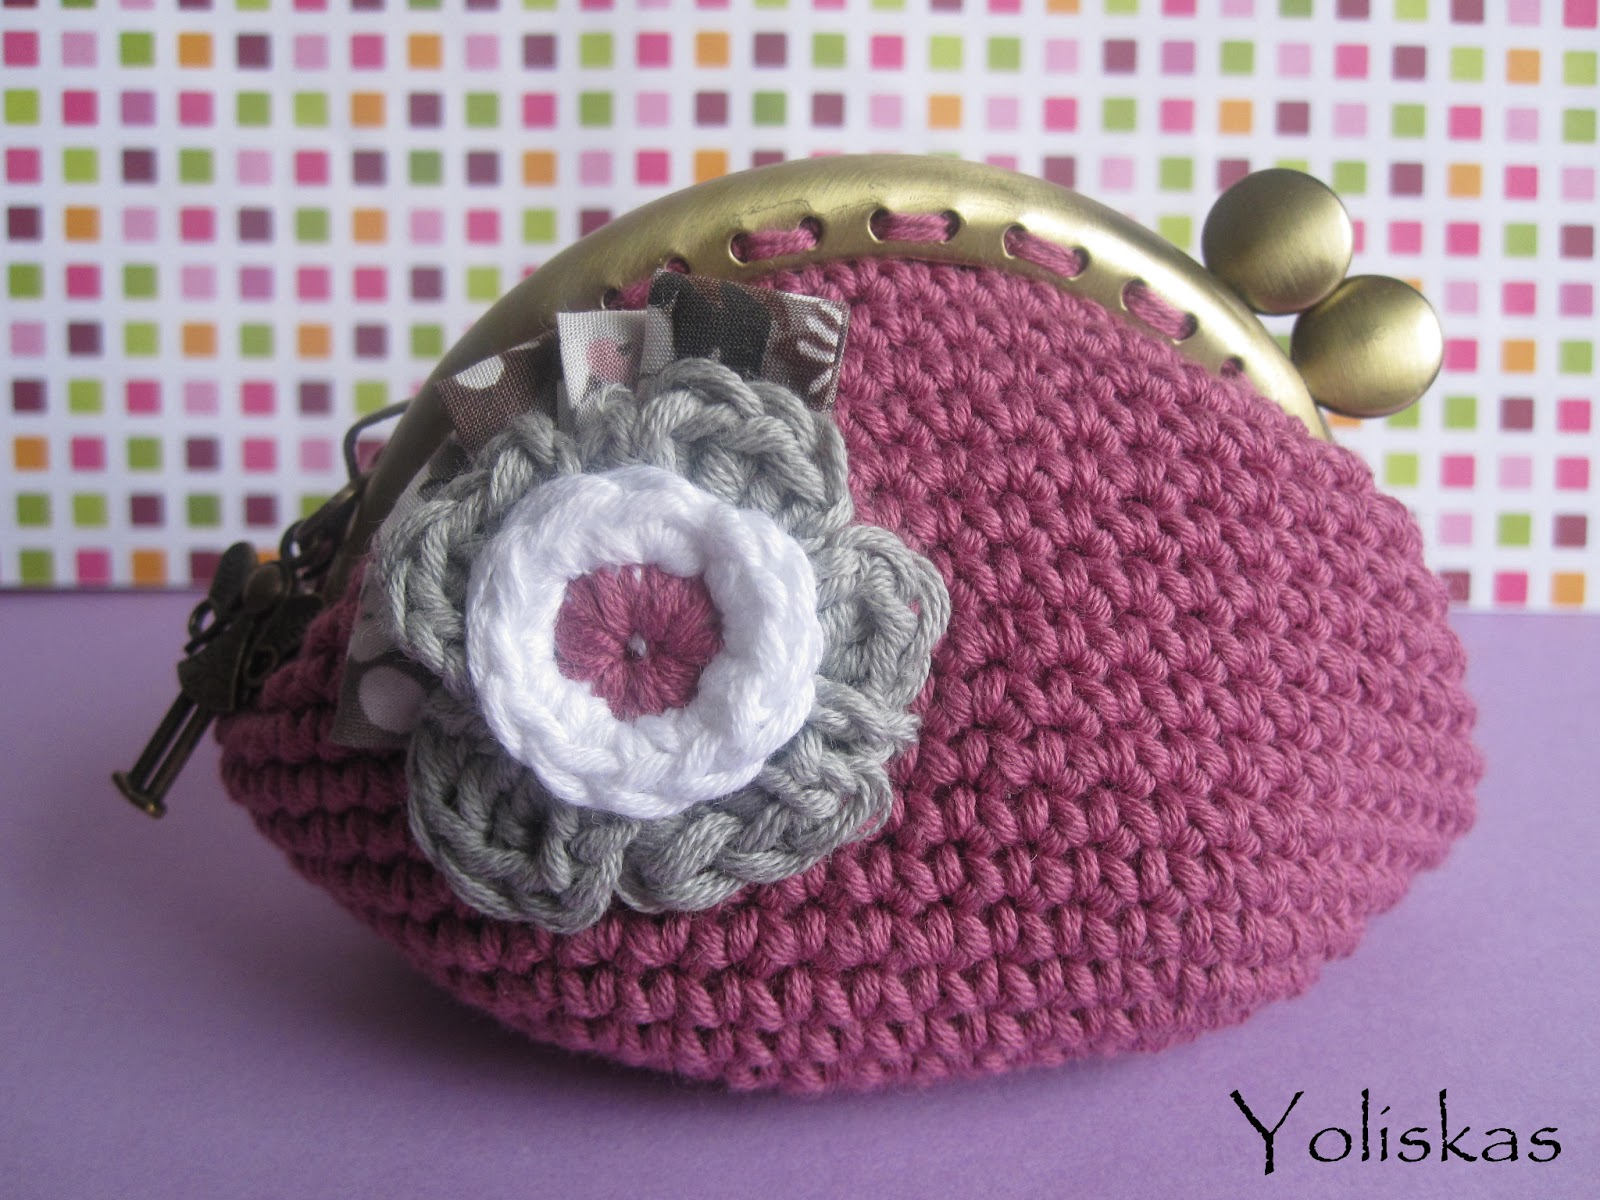 Monederos en crochet - Imagui